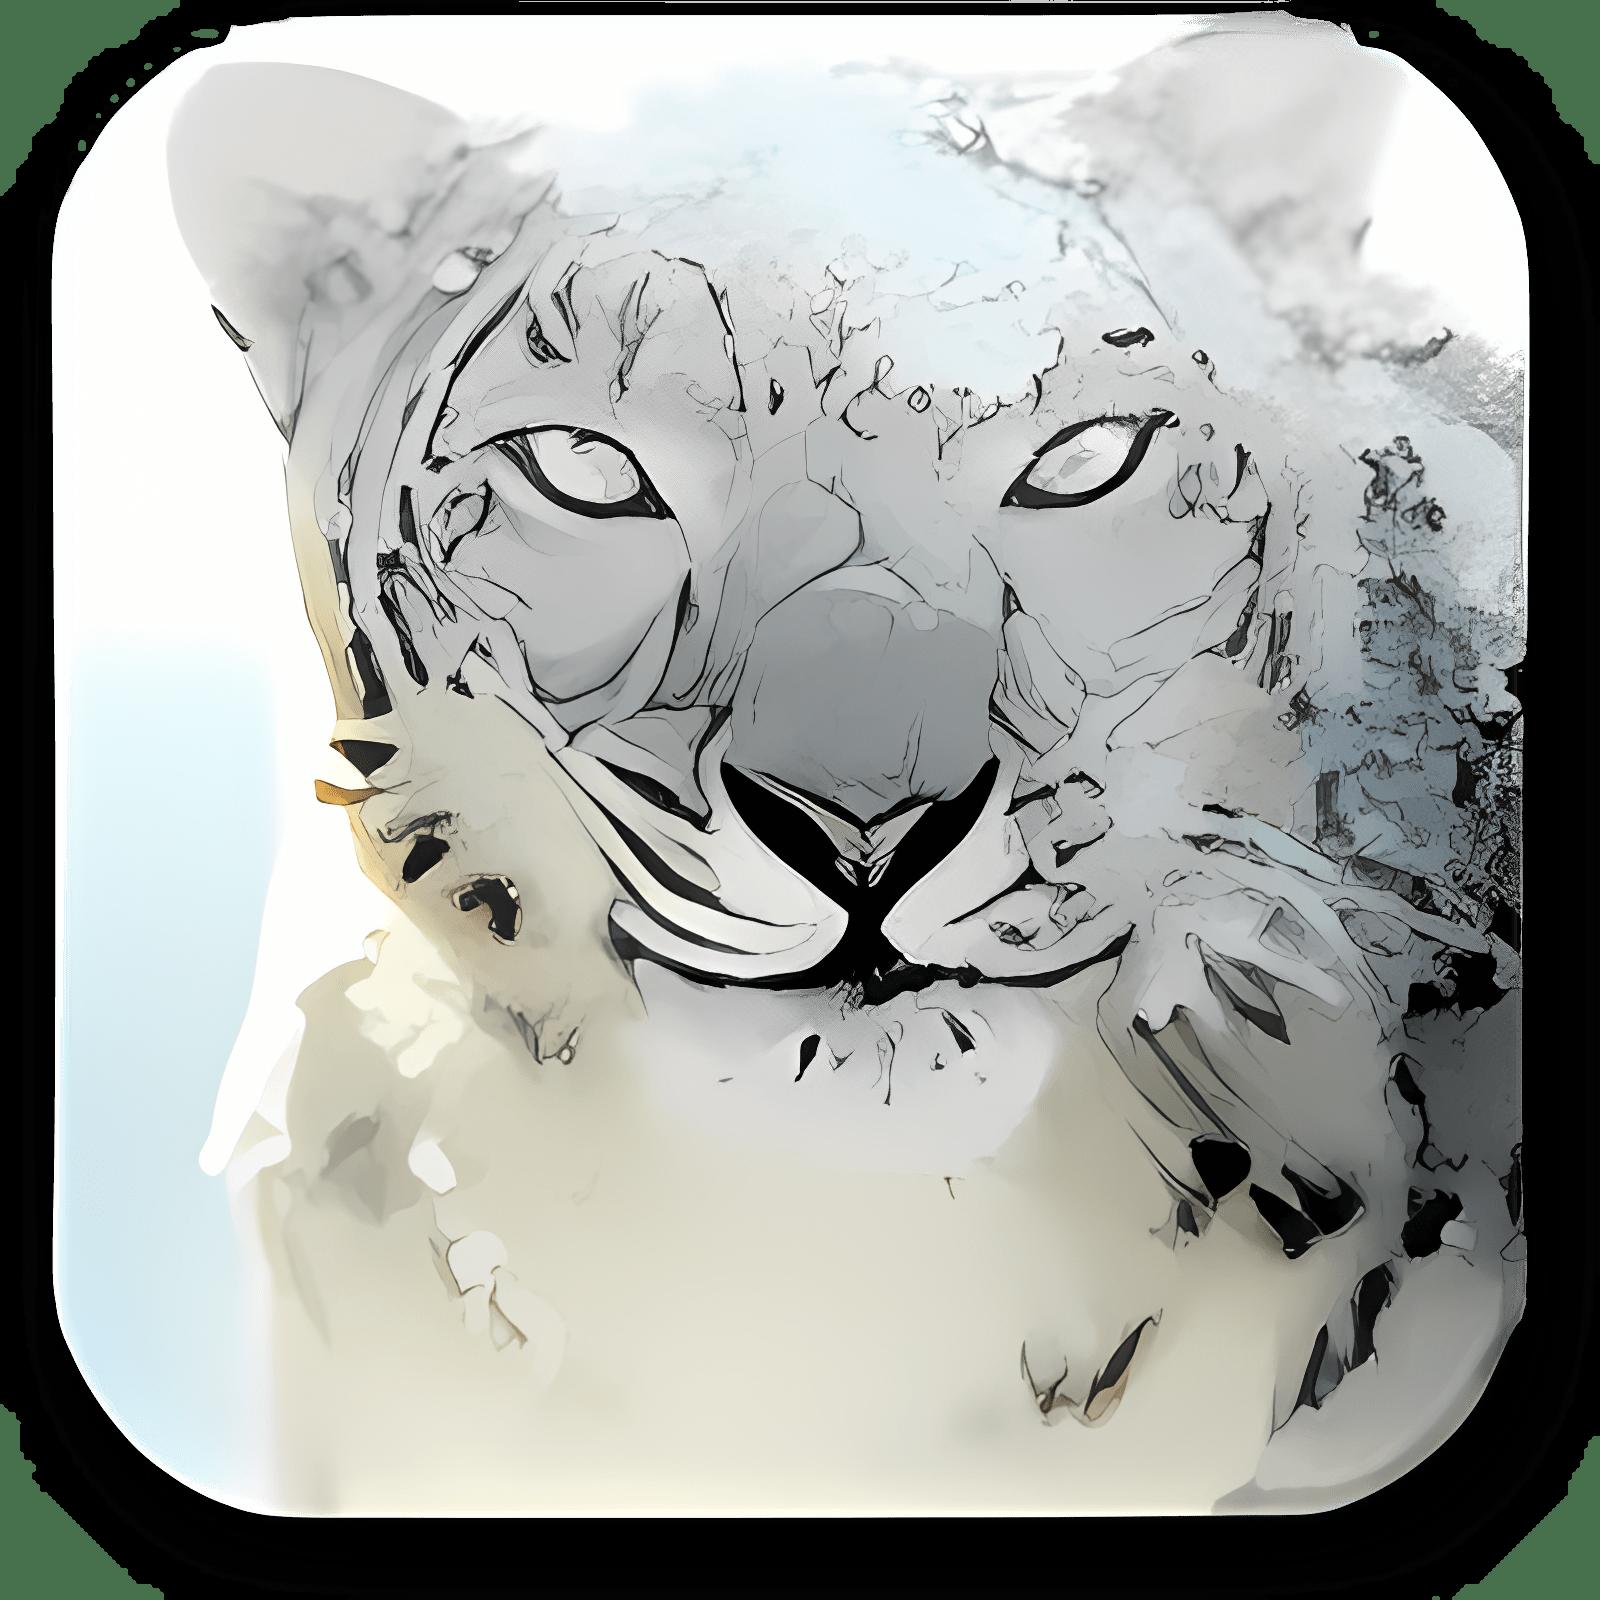 Mac OS X Snow Leopard Wallpapers